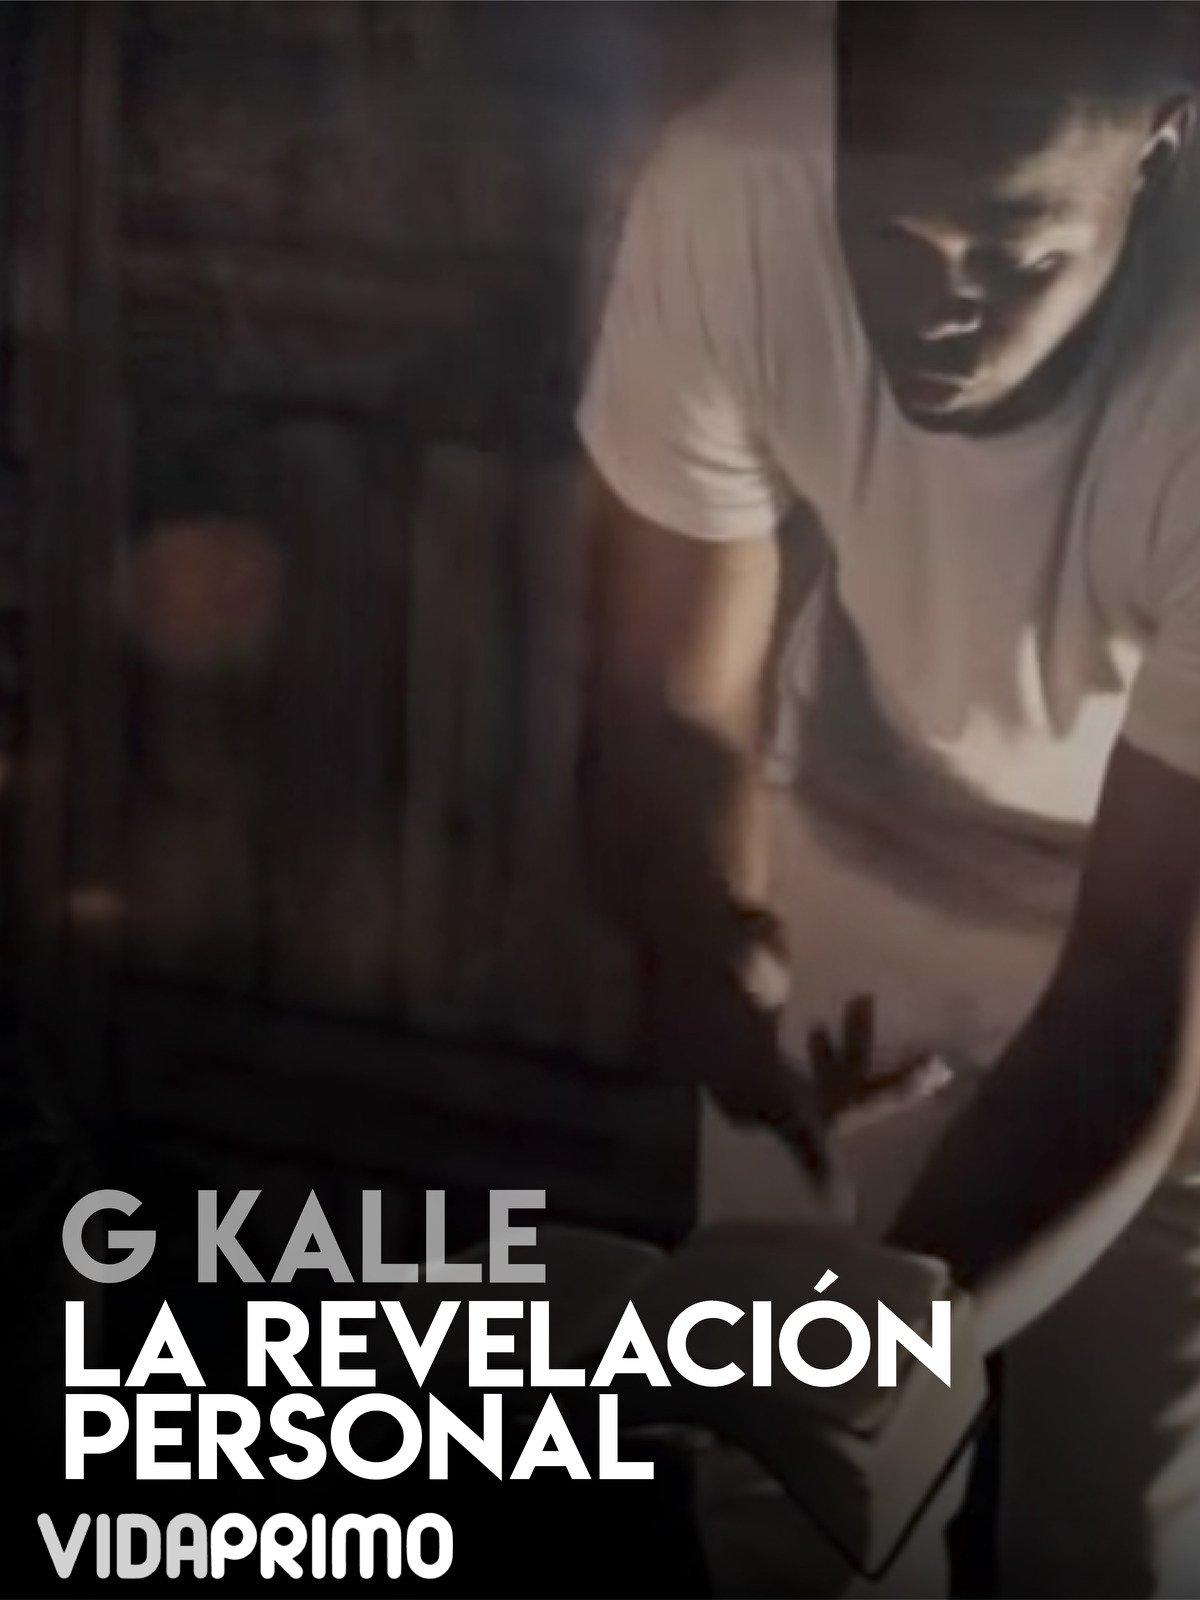 G Kalle